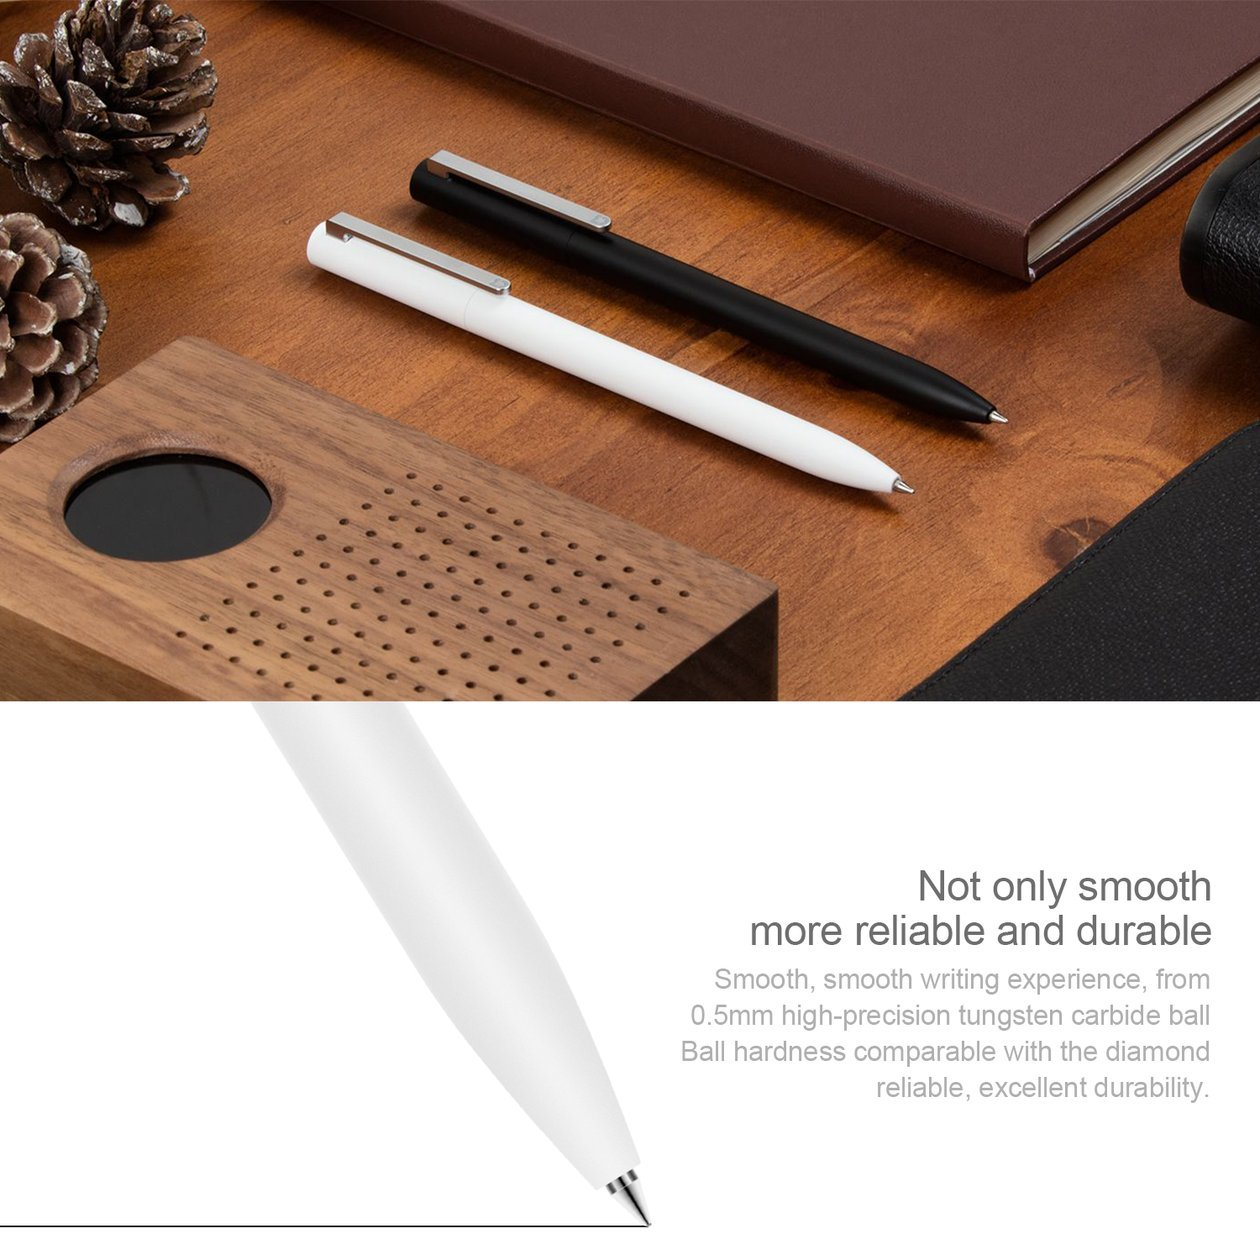 Penne Xiaomi Mijia Universal Roller Durable Smooth Signing Pen con disegno bianco retrattile e ricaricabile